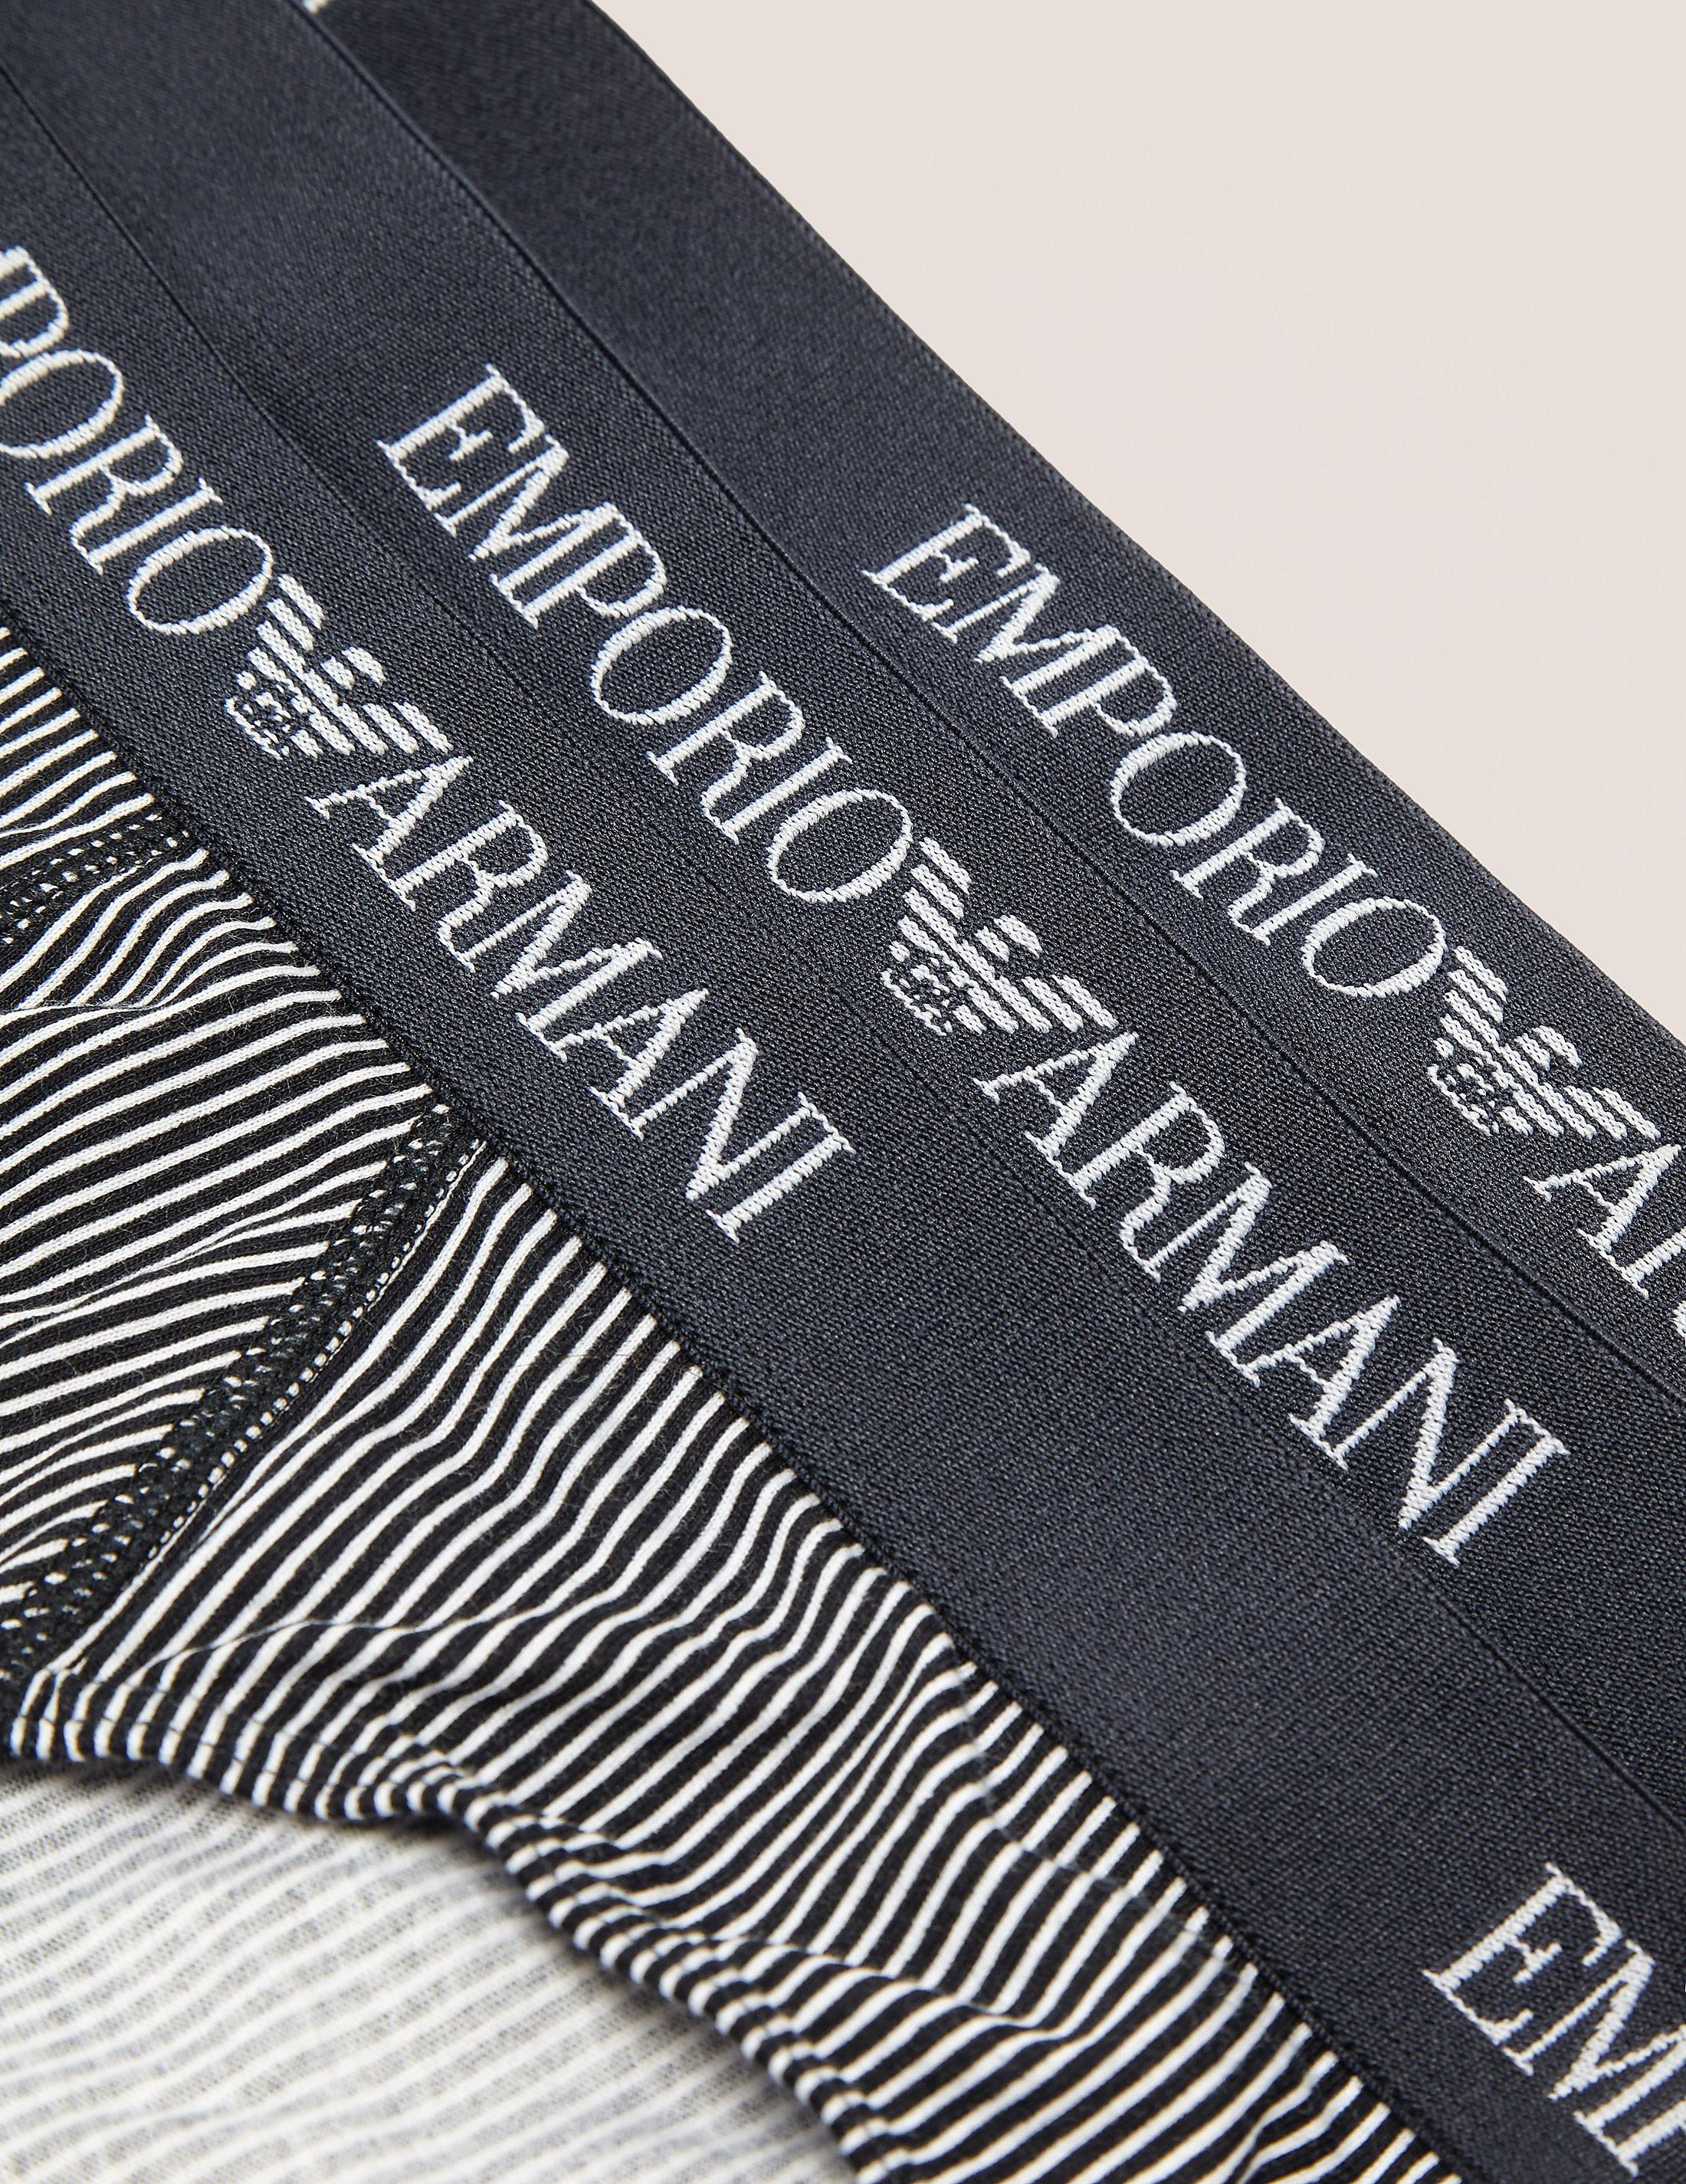 Emporio Armani 3 Pack Brief